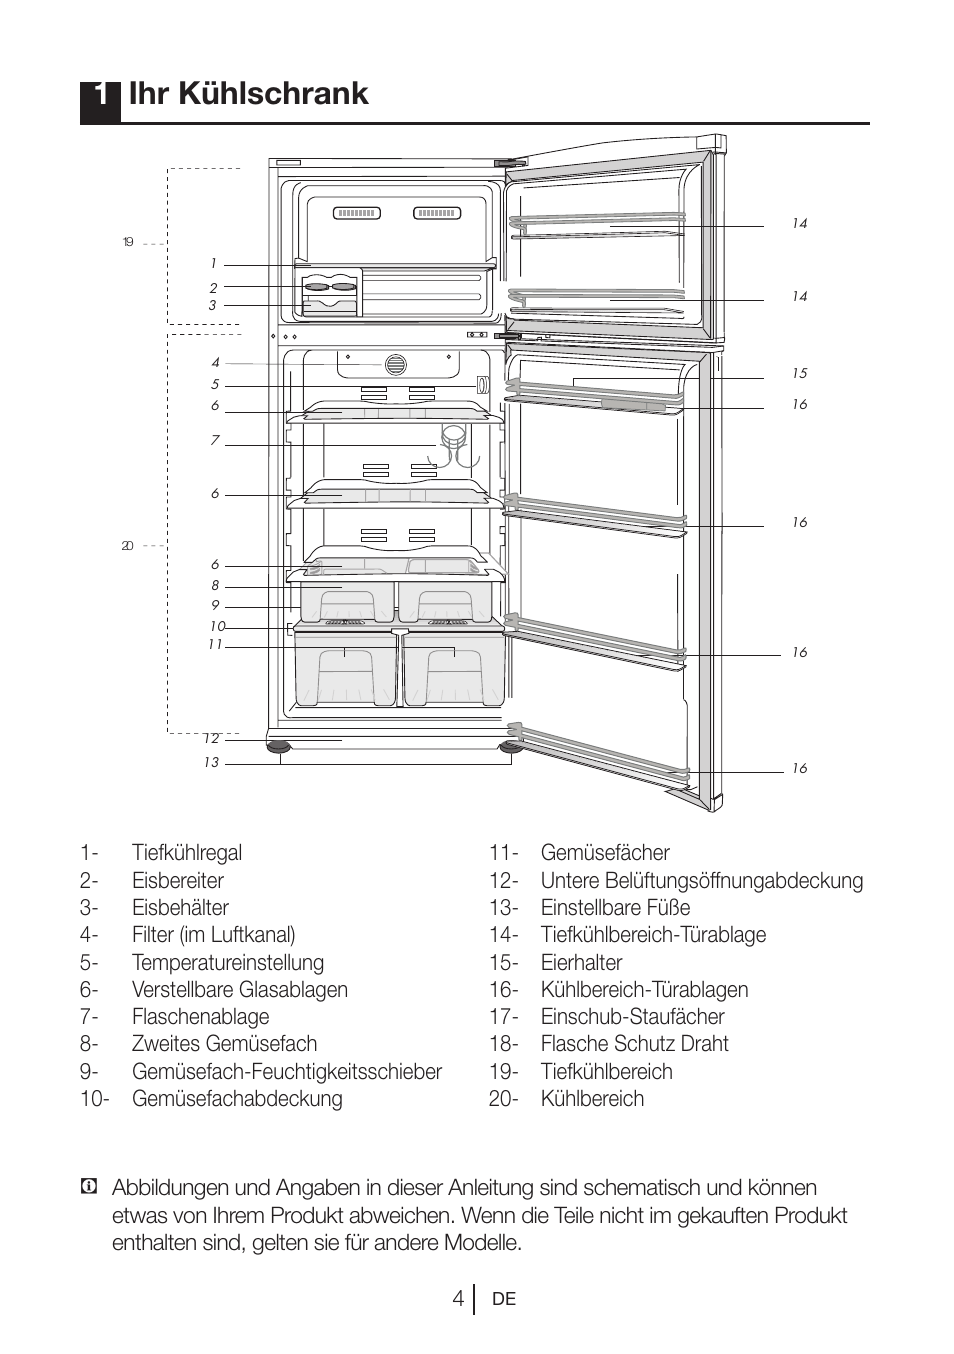 1ihr kühlschrank | Blomberg DNE 9860 X A+ User Manual | Page 25 / 81 ...